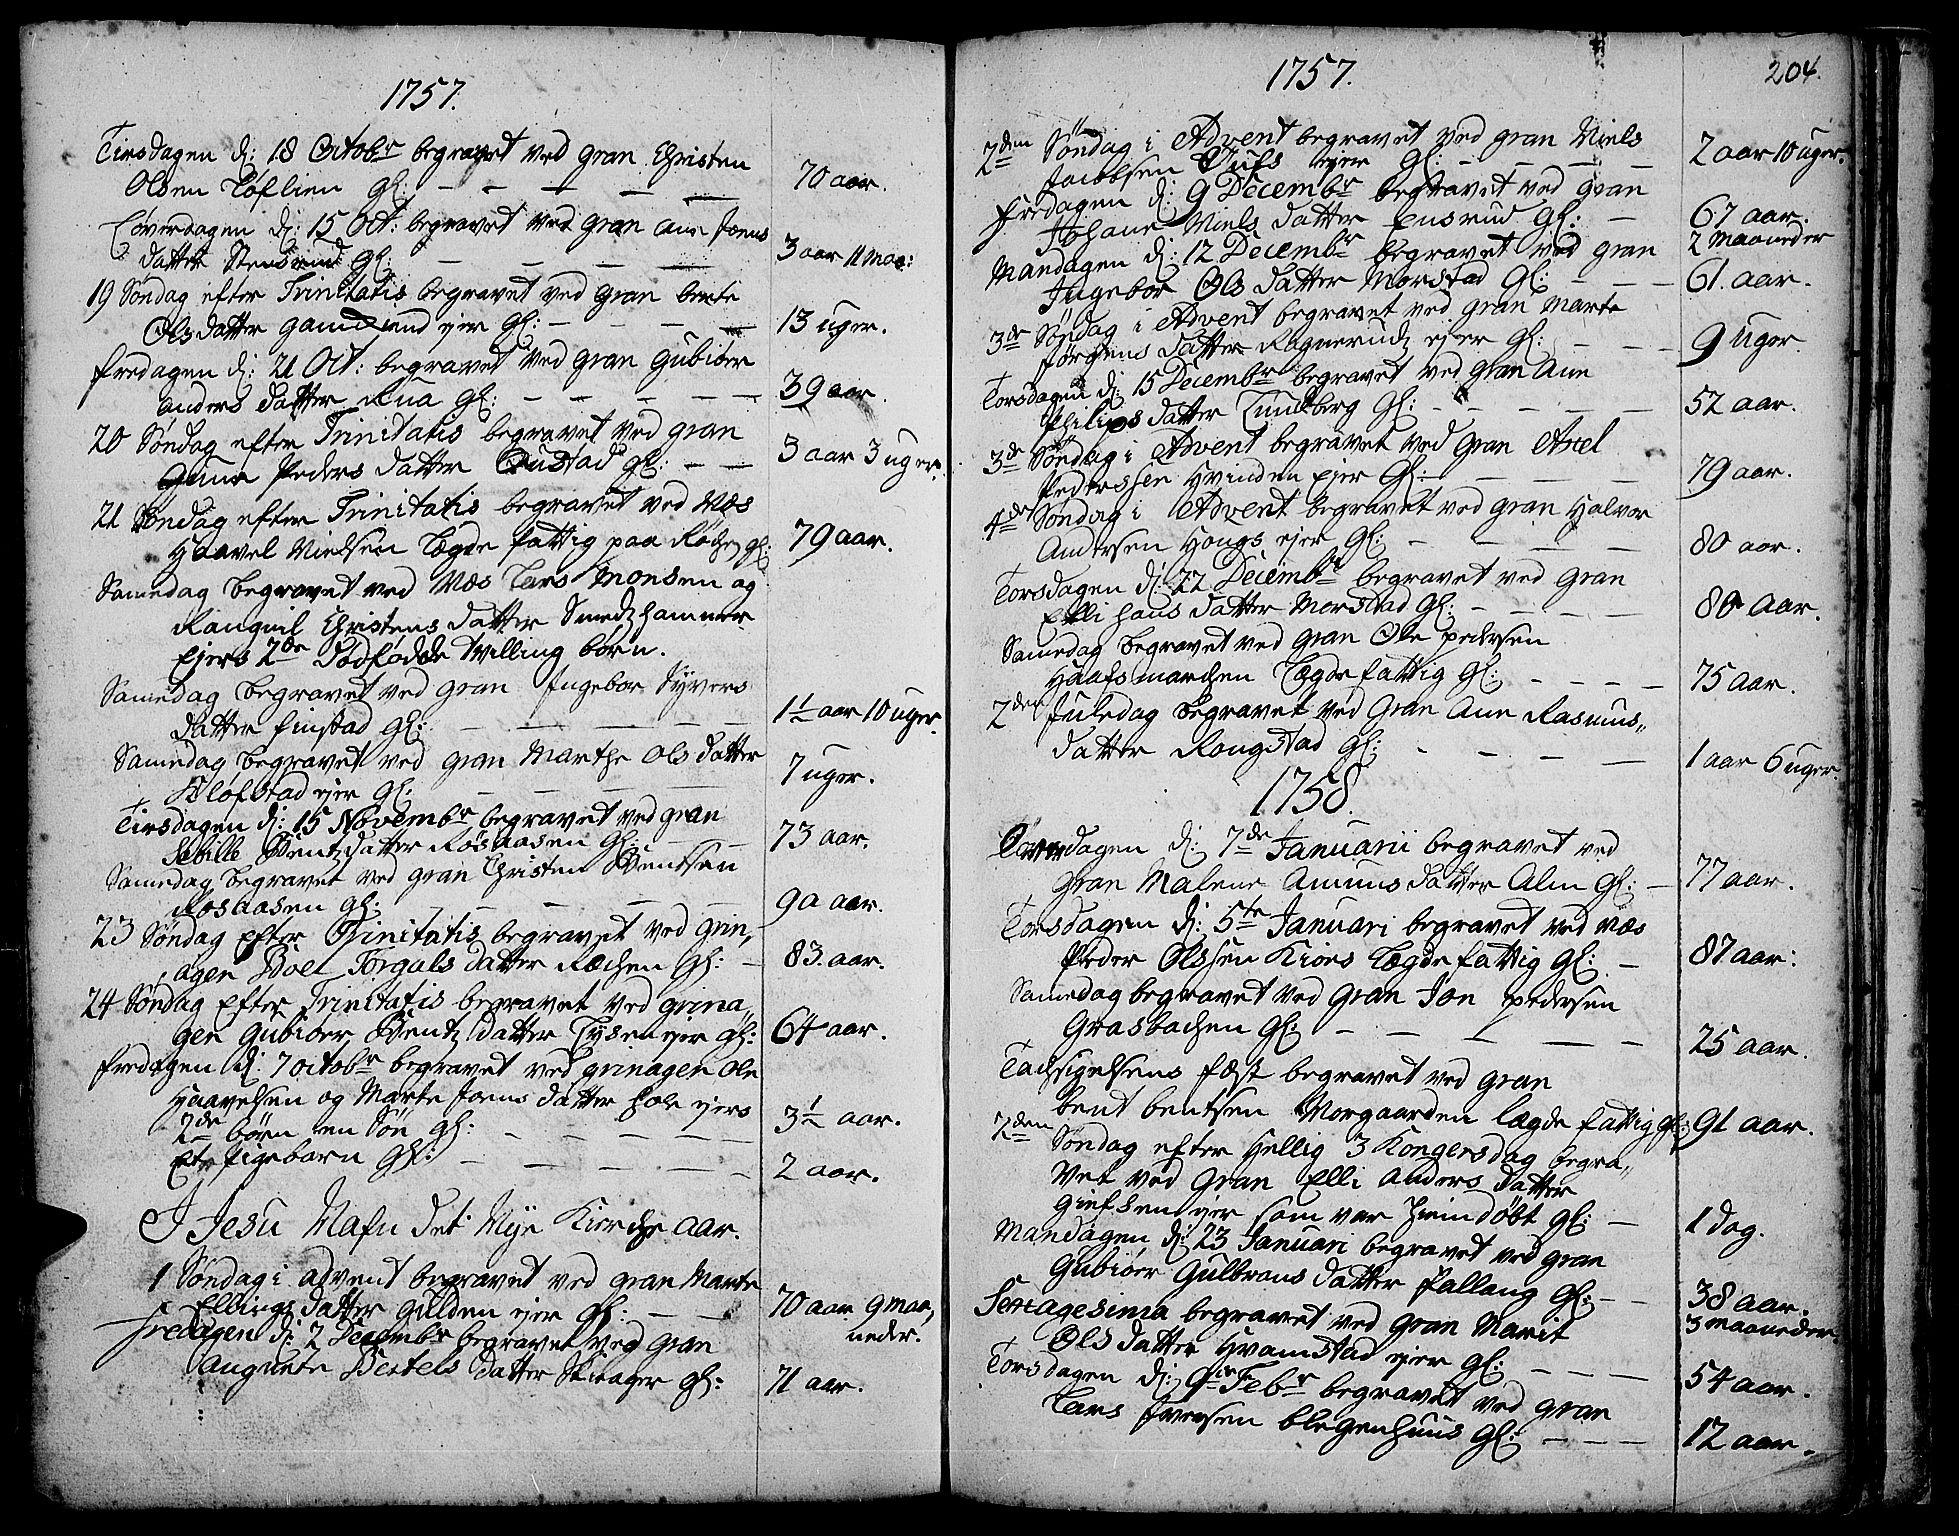 SAH, Gran prestekontor, Ministerialbok nr. 3, 1745-1758, s. 204